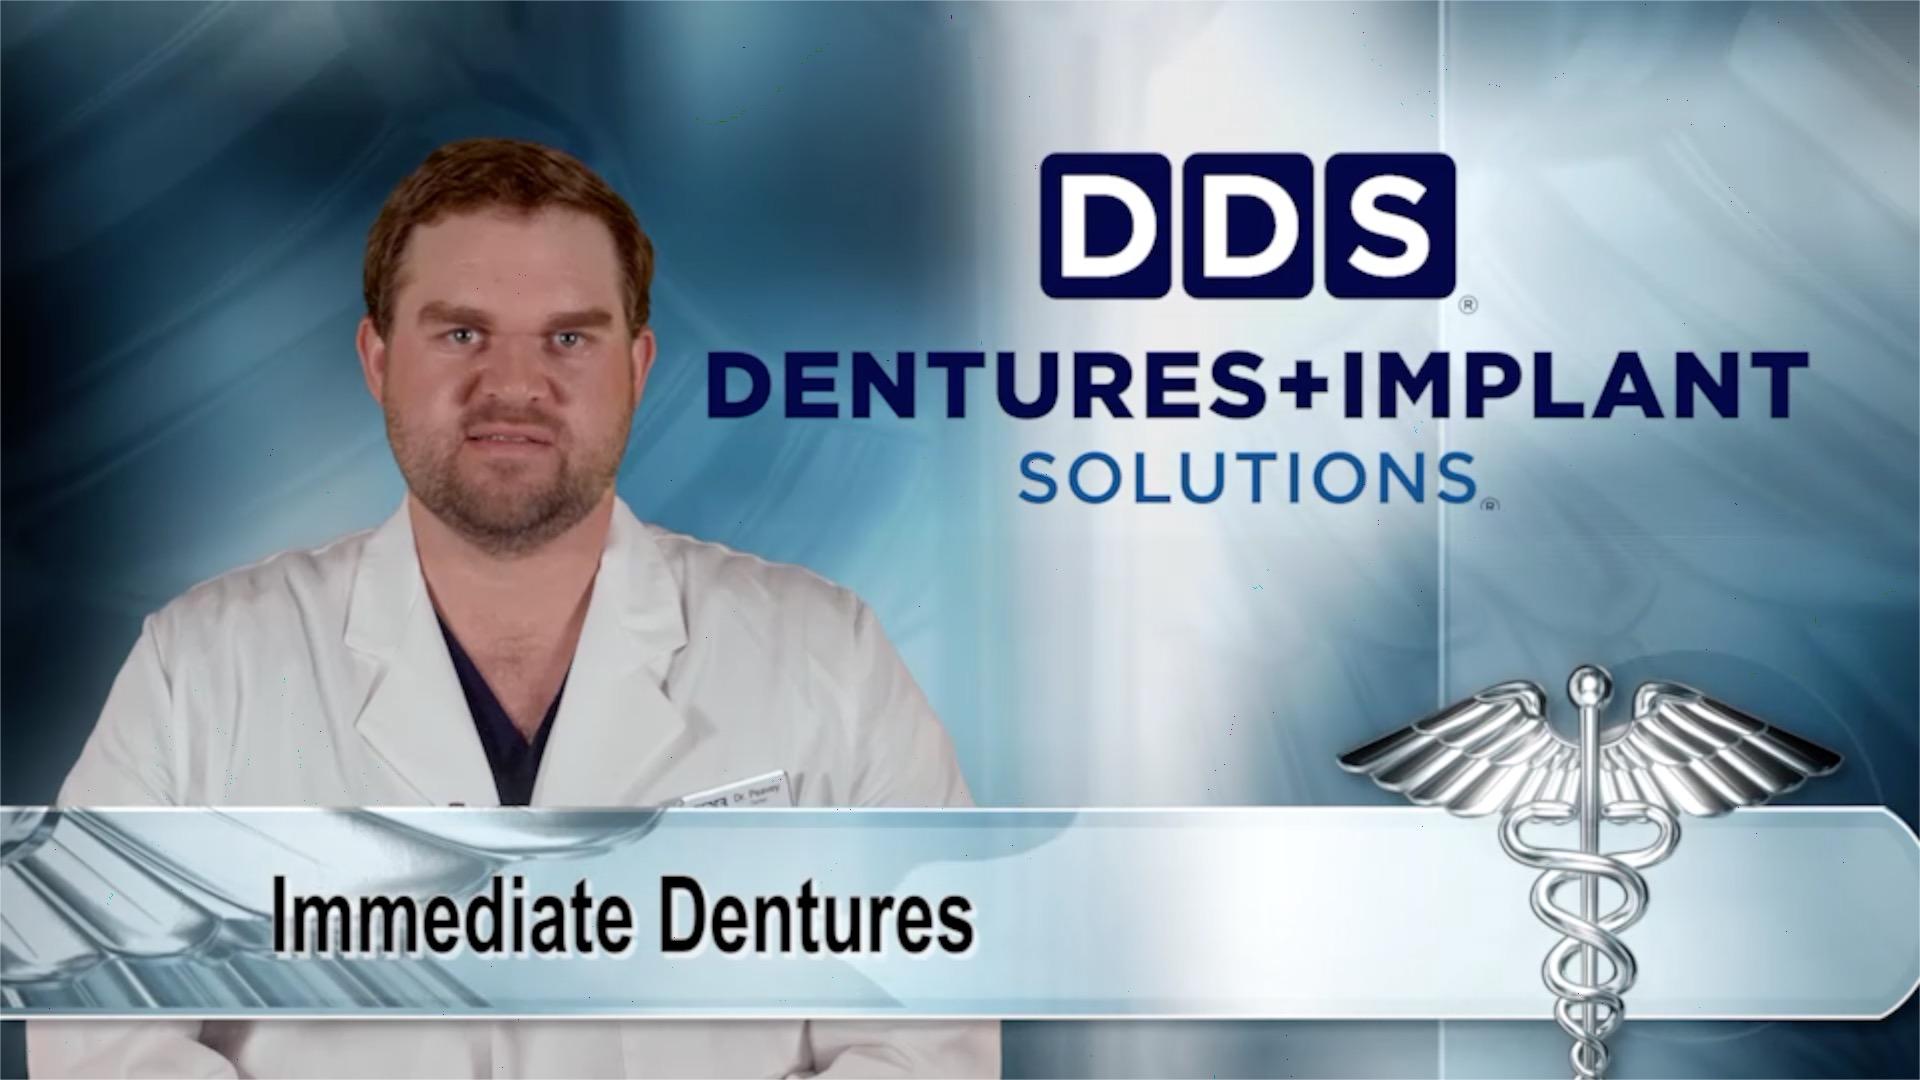 Image for Medical Minute: DDS Dentures + Implant Solutions - Immediate Dentures